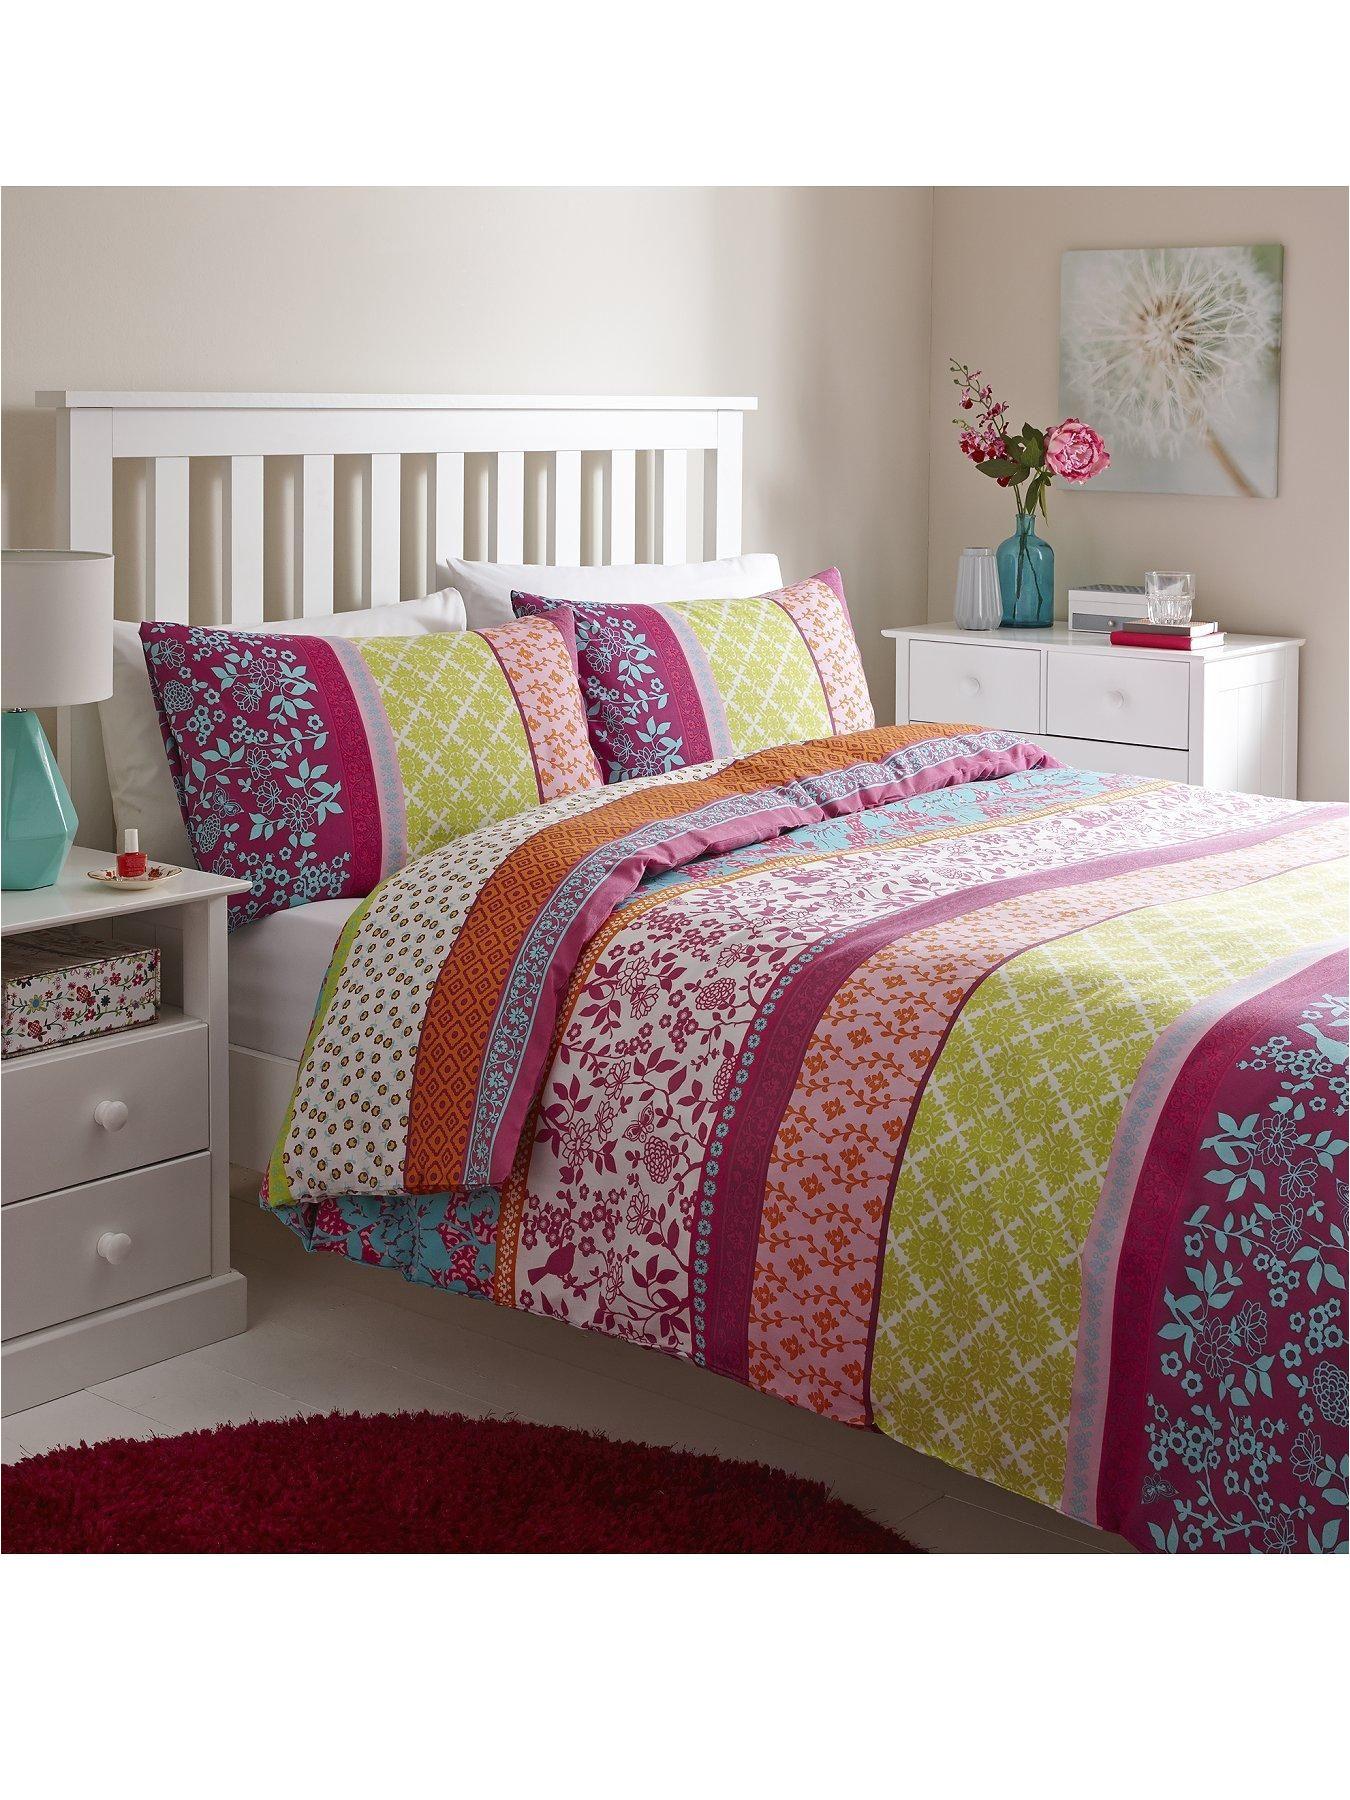 chloe duvet cover set a fabulous multi coloured print stripe bedding colour multi 60 cotton 40 polyester machine washable